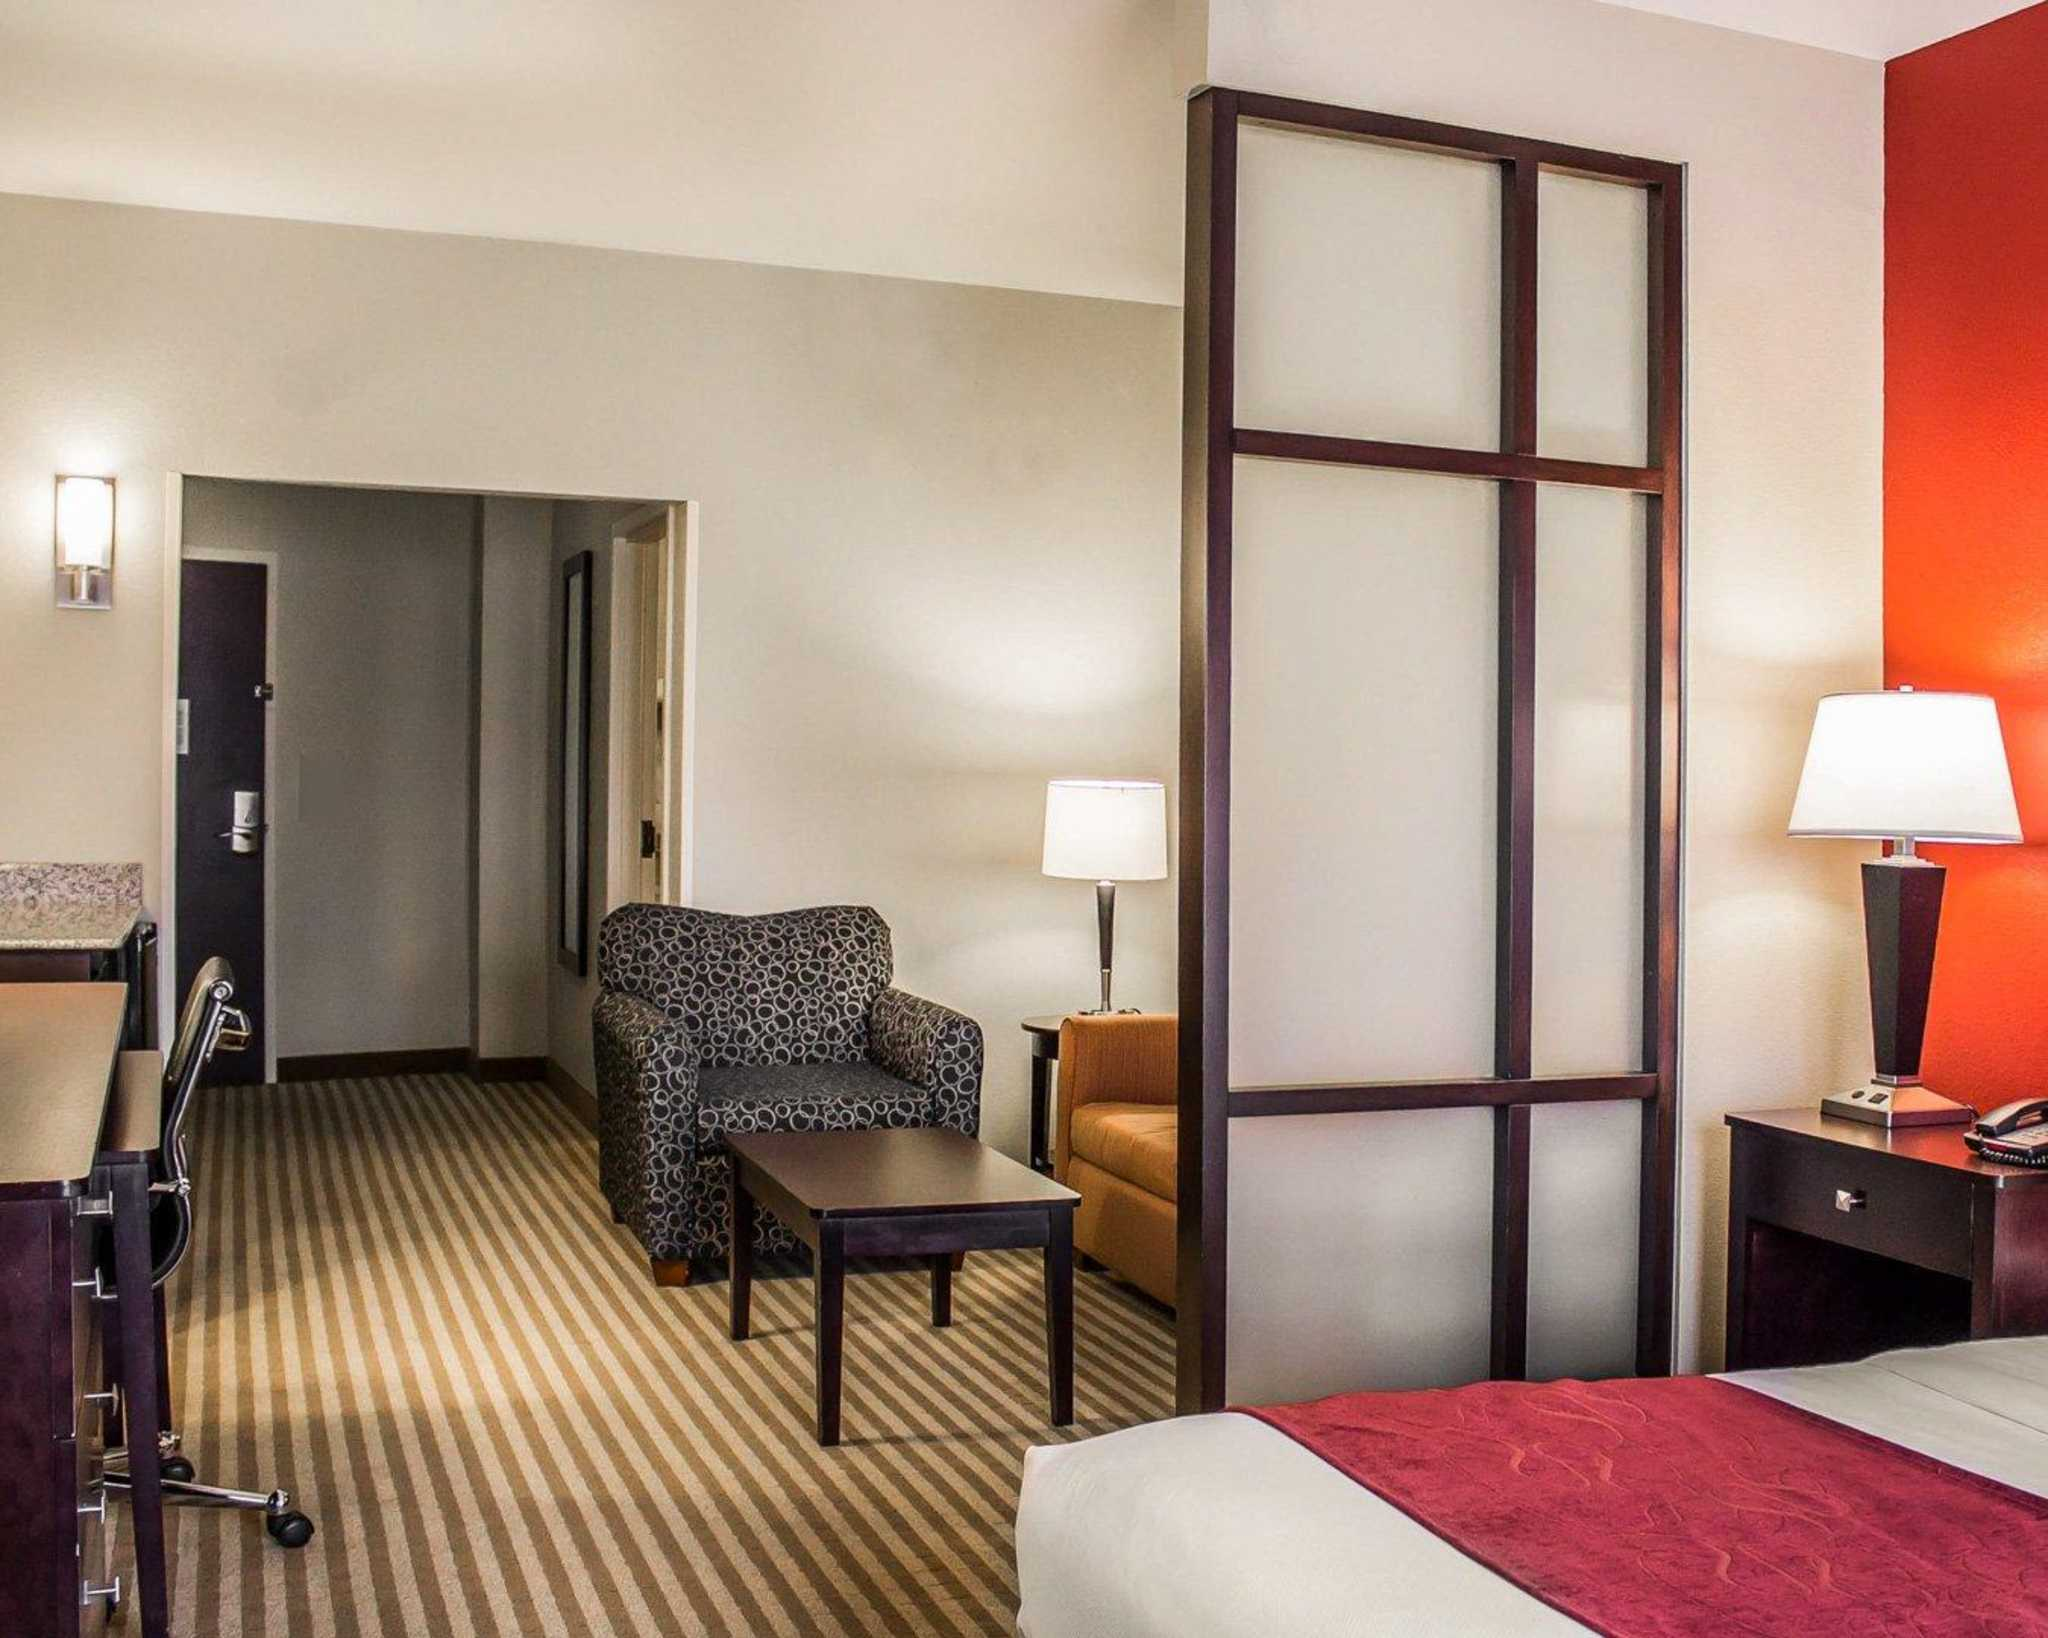 Comfort Suites East Broad at 270 image 13